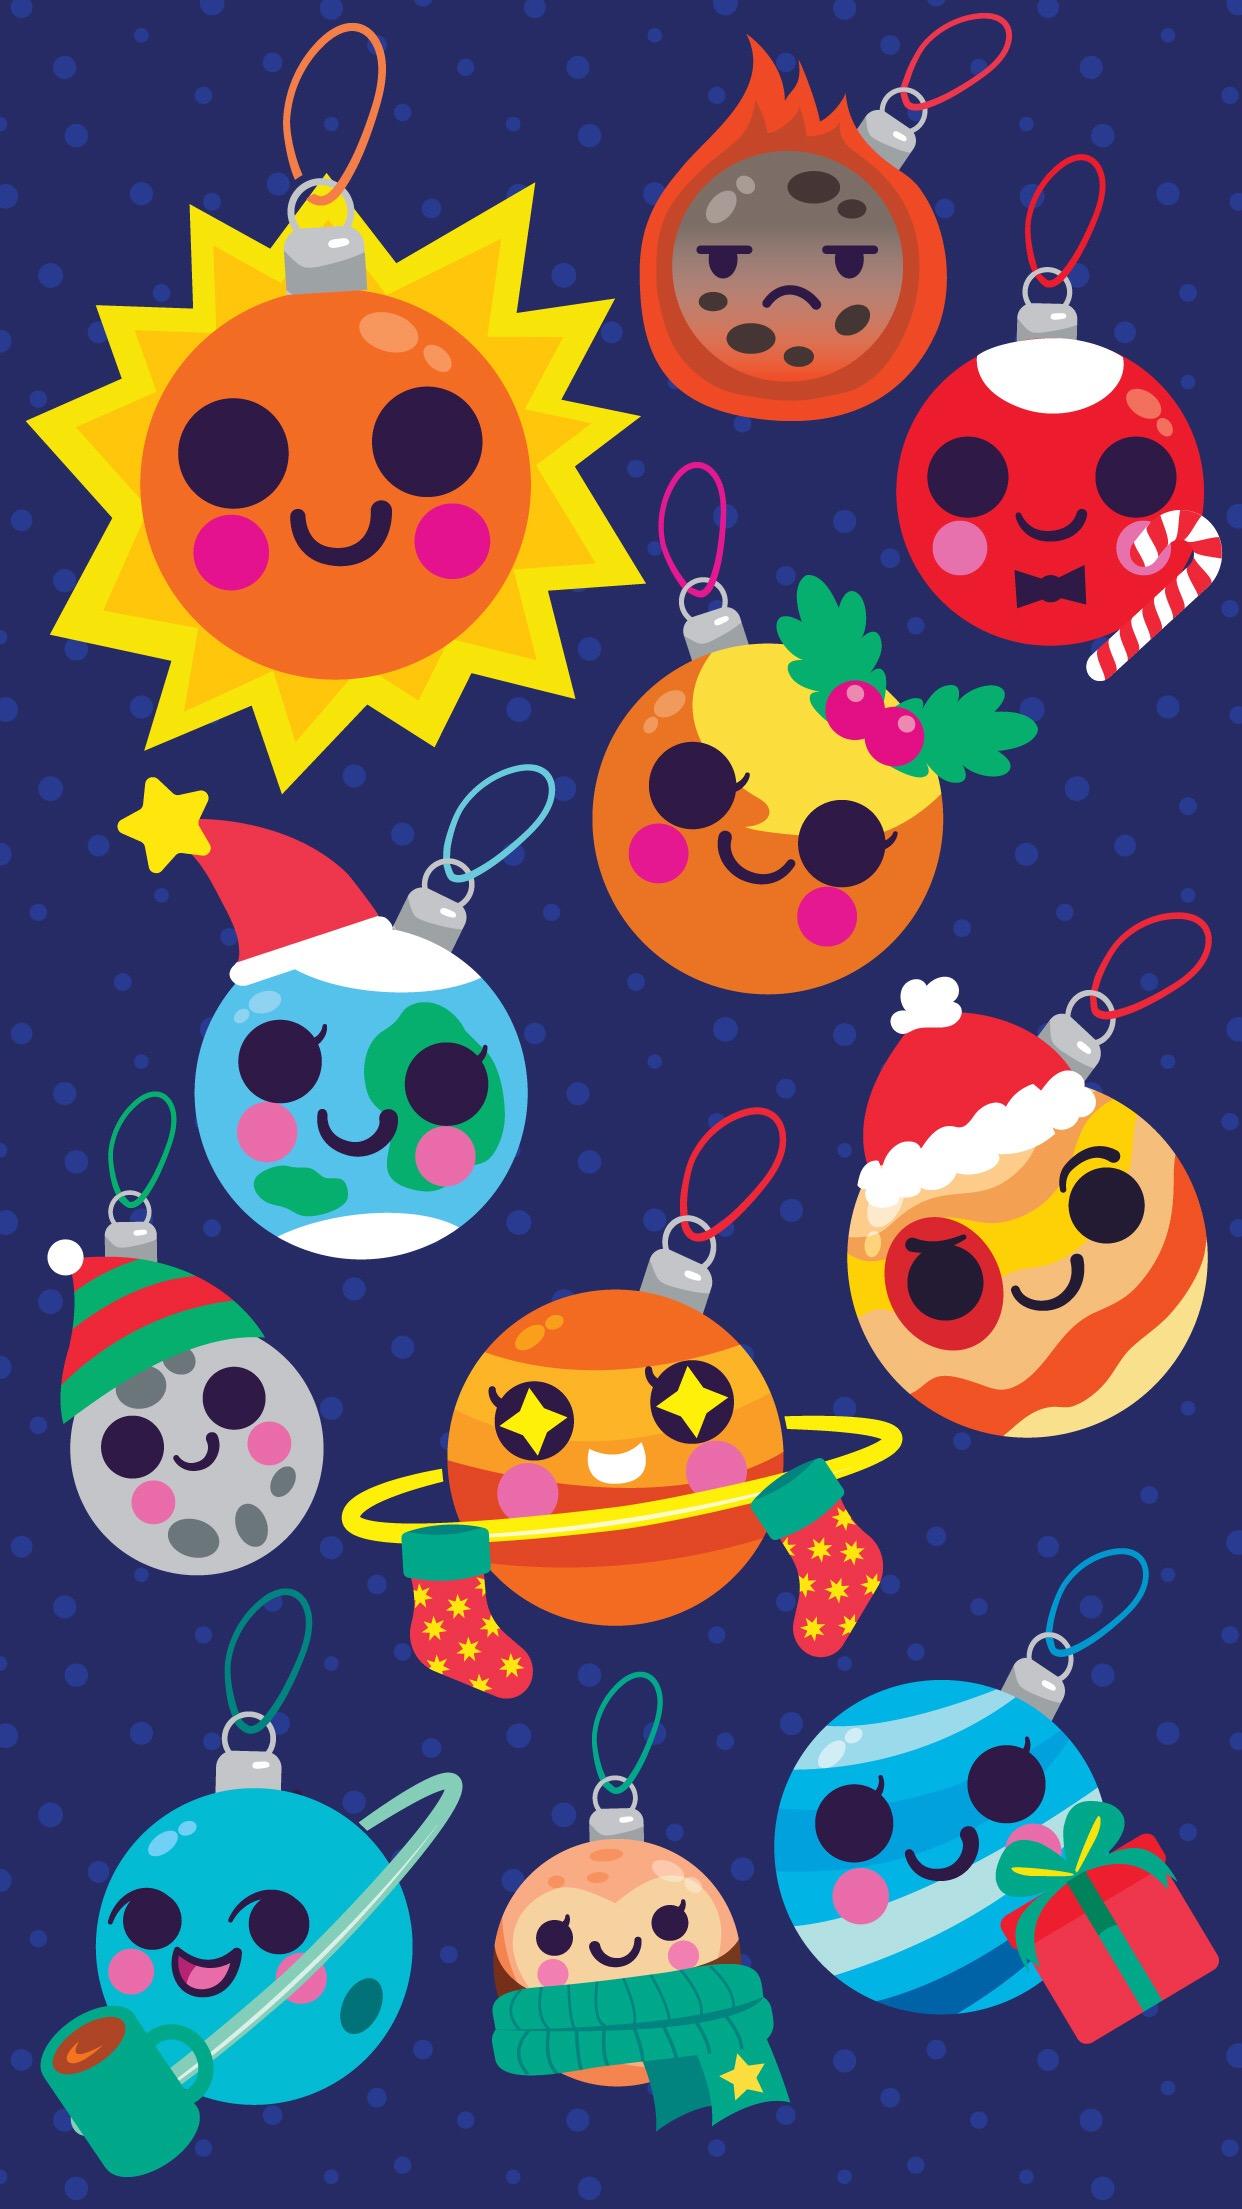 Starry Ornaments Wallpaper